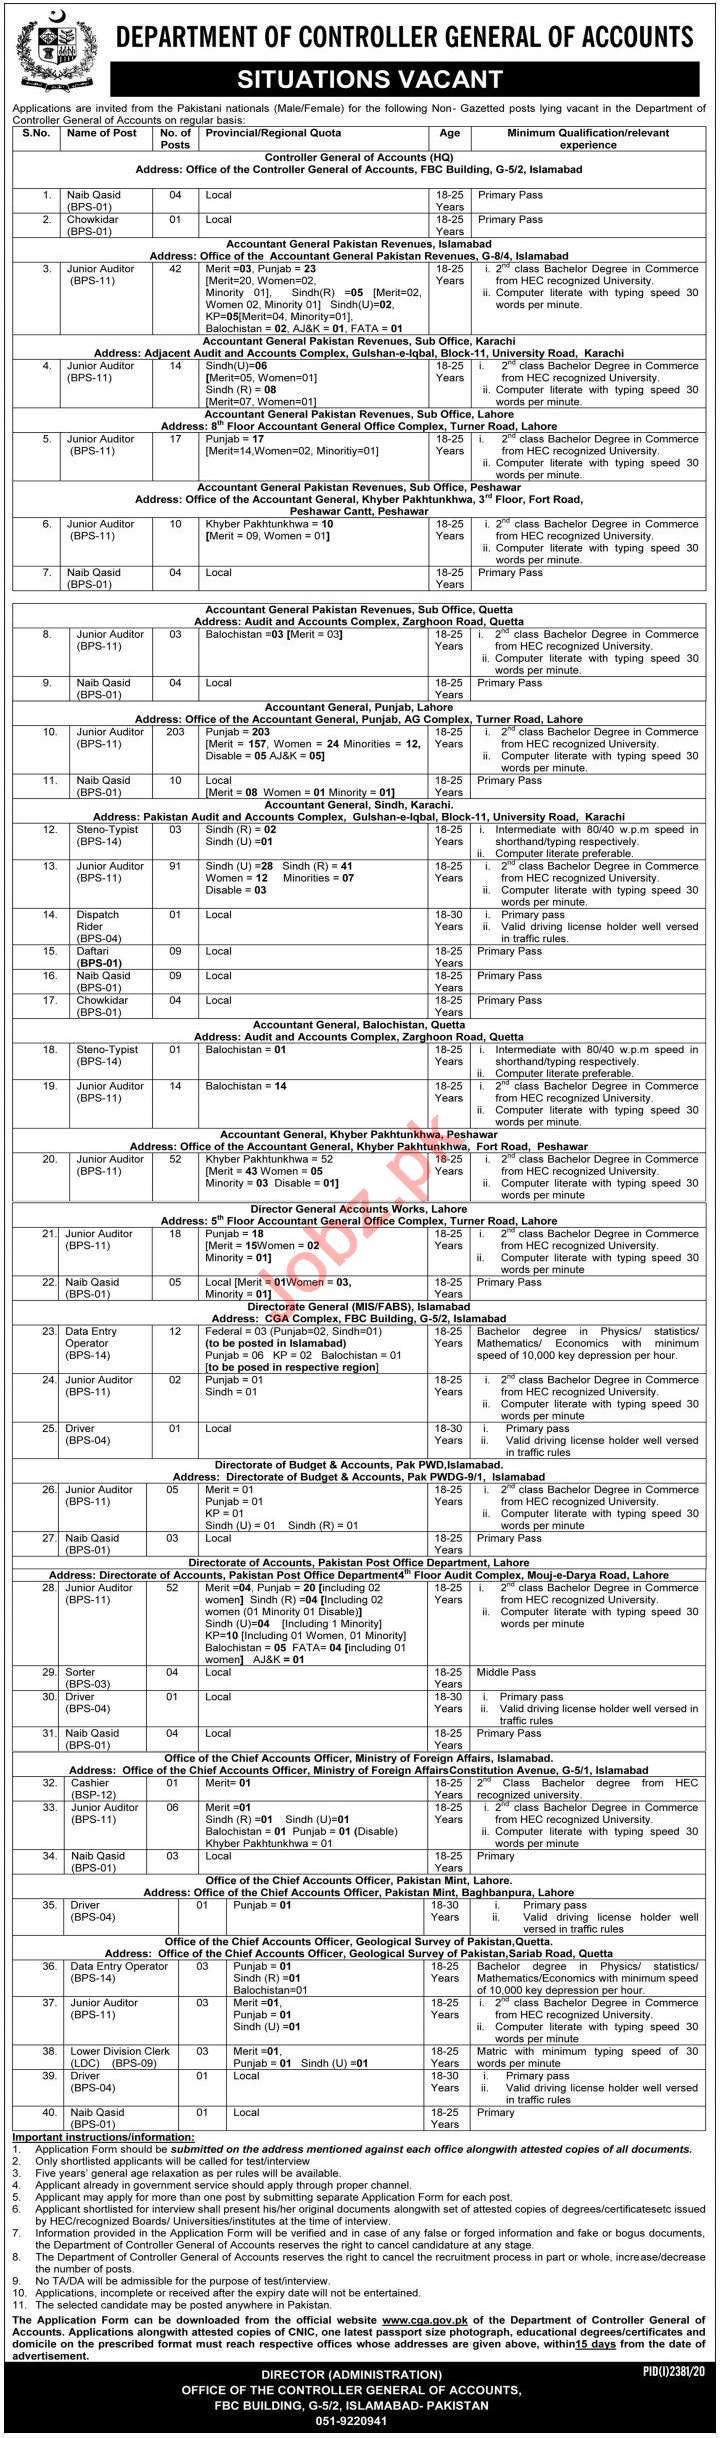 Controller General of Accounts CGA November 2020 Latest Jobs in Pakistan 2020 - Download Job Application Form - www.cga.gov.pk